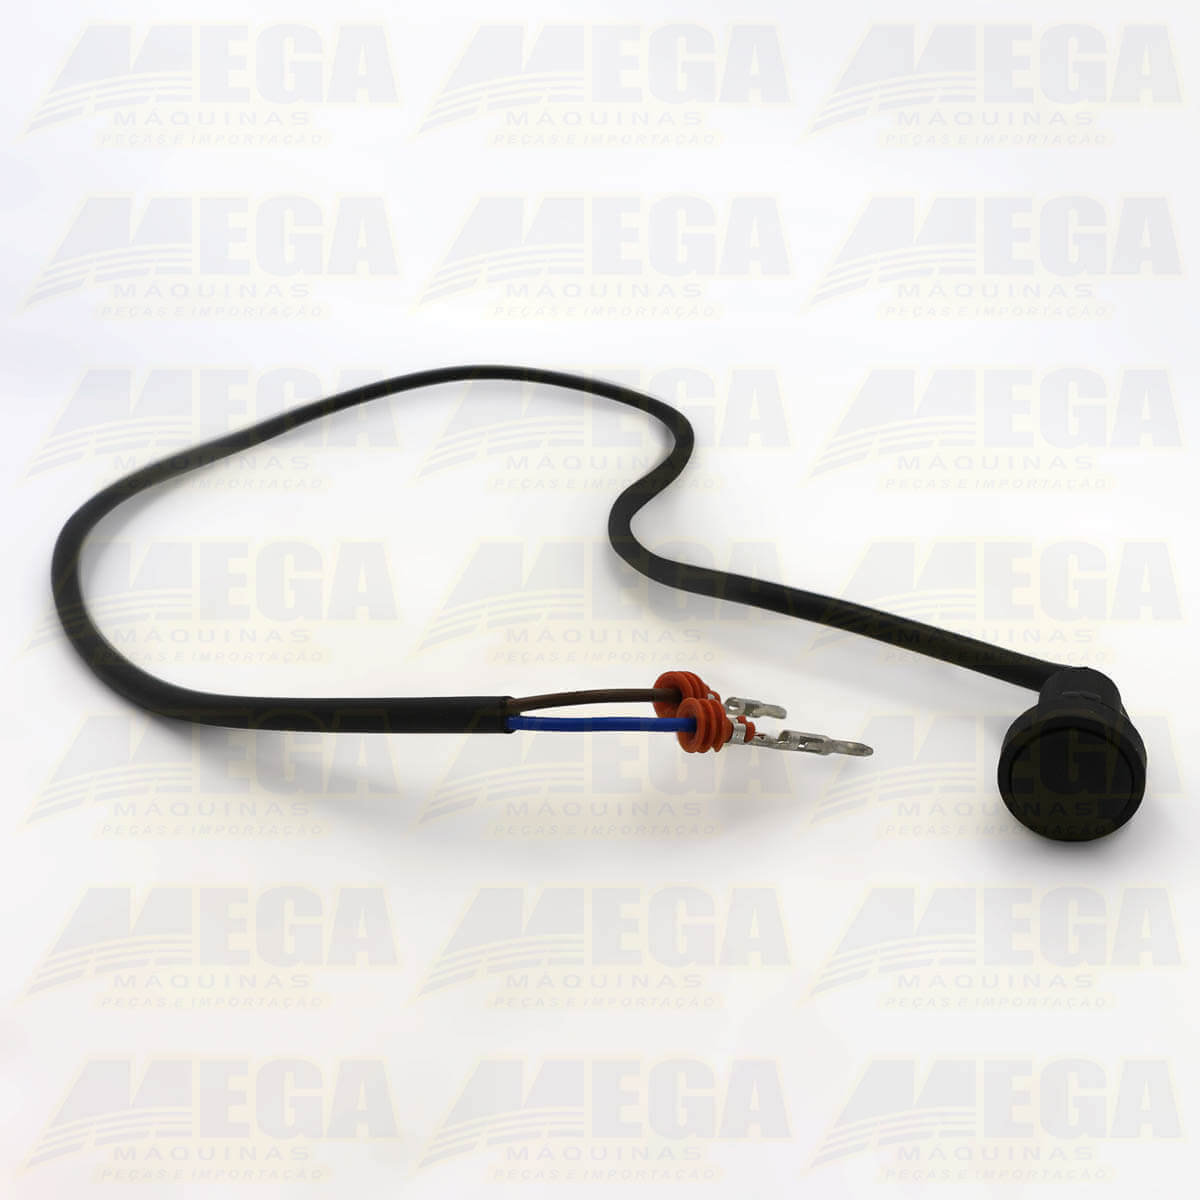 Interruptor do Sensor da Manopla 701/42600 70142600